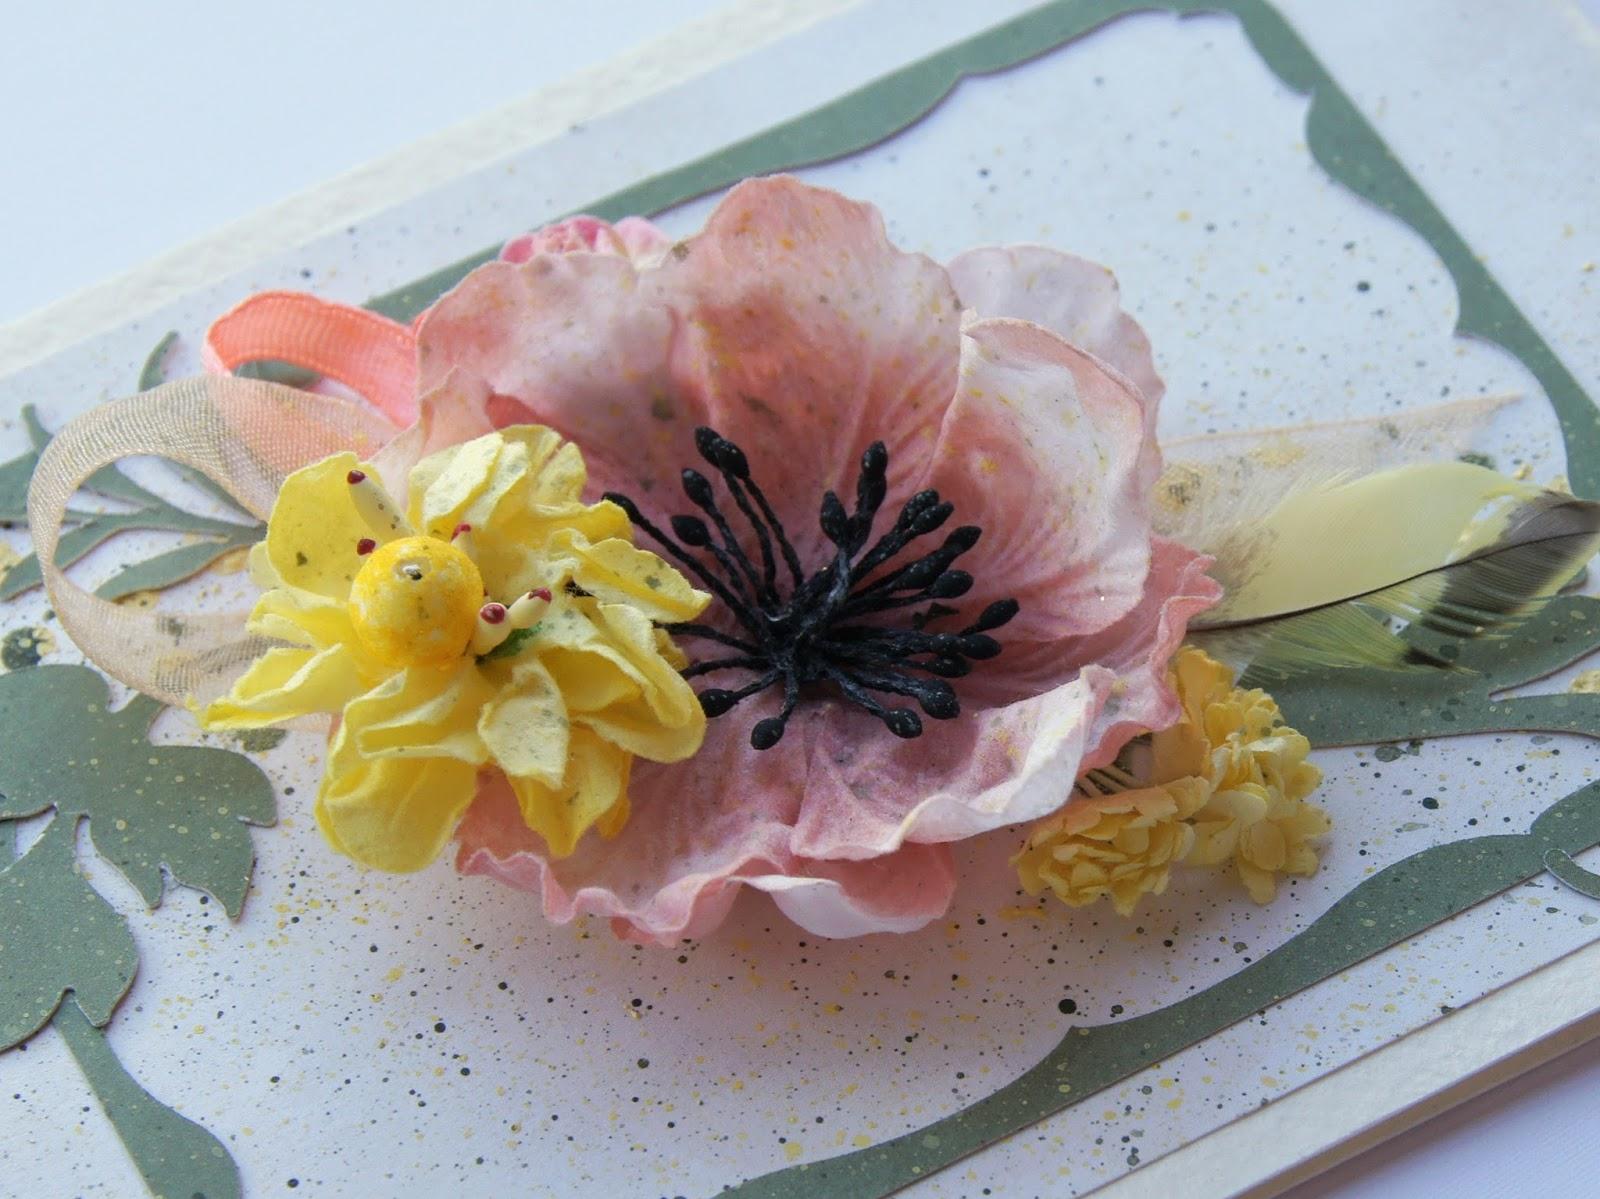 цветы, ленточки, перья